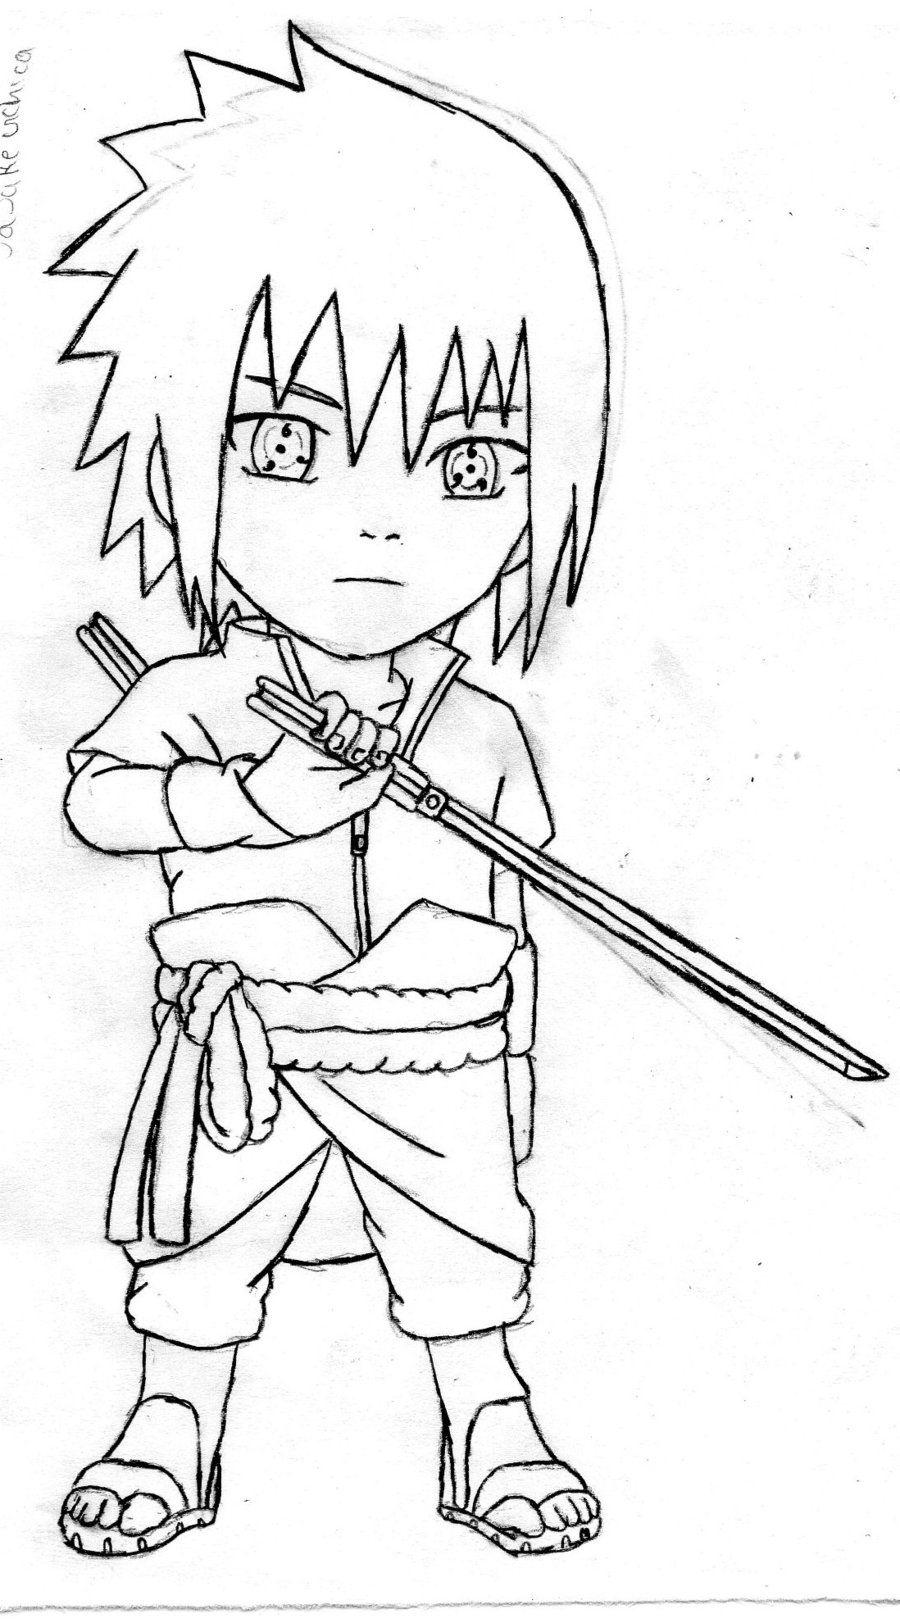 sasuke uchiha chibi by thesexychurro lineart chibi u0027s